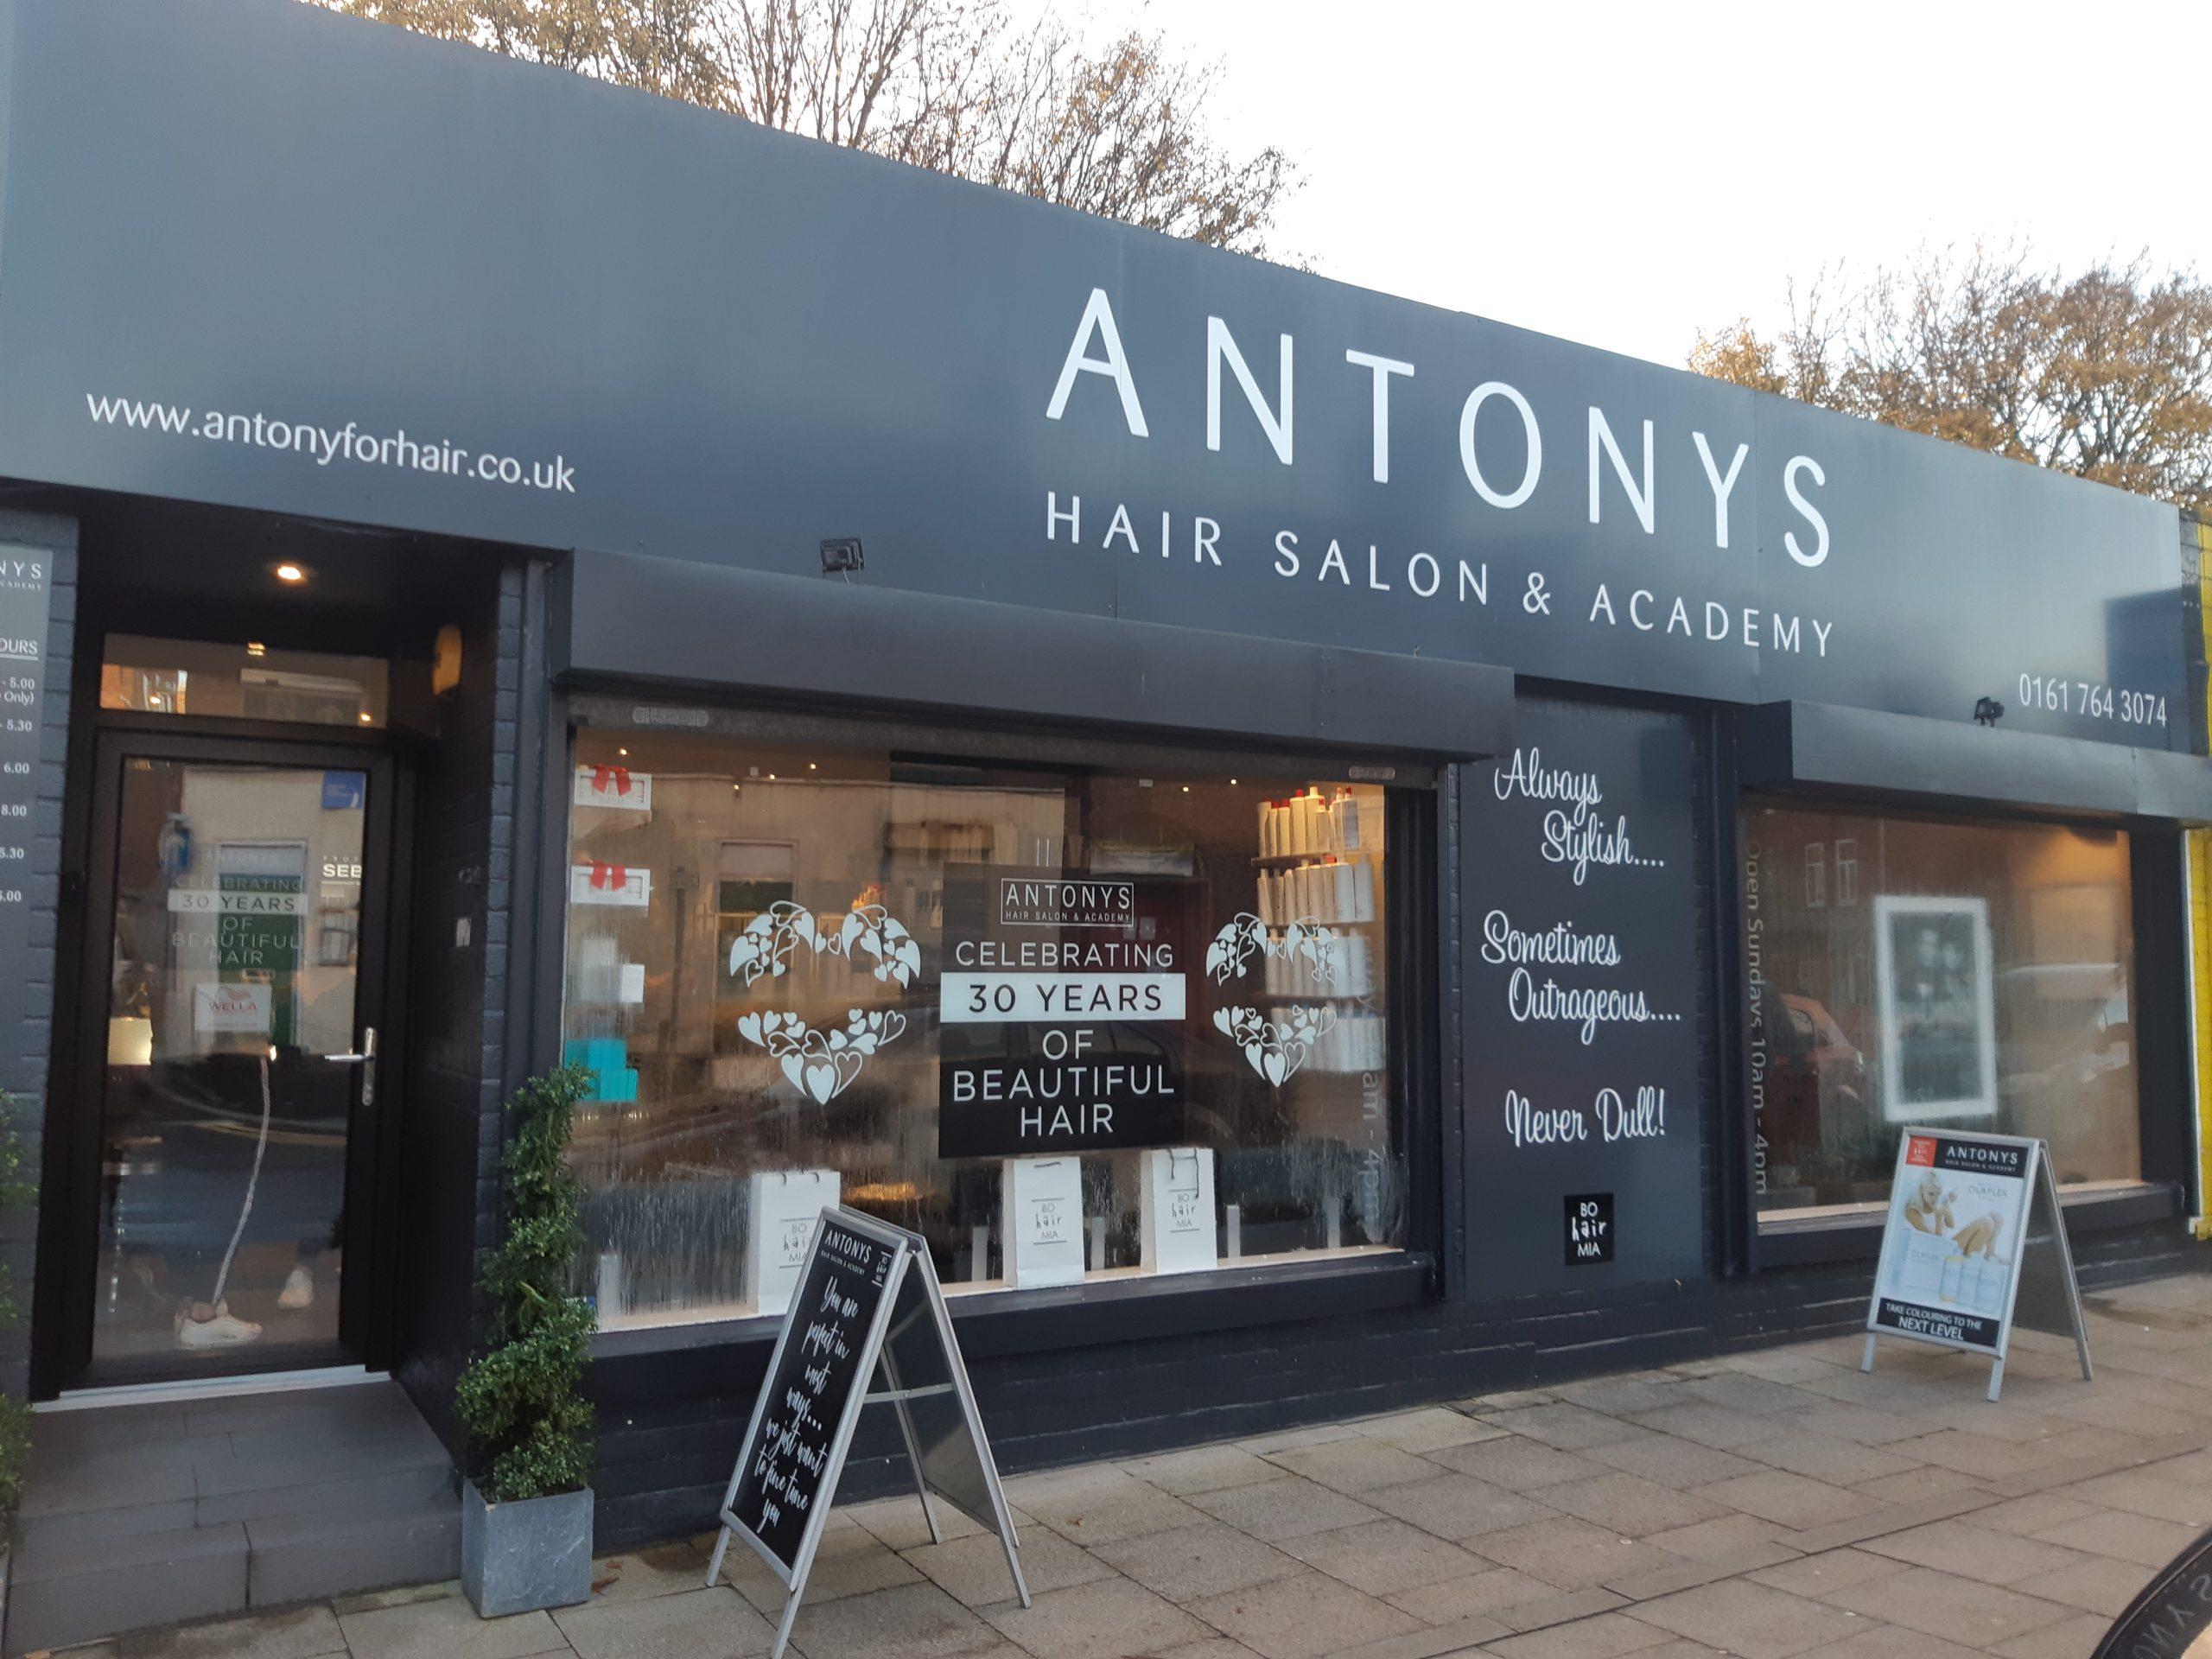 Business Spotlight: Celebrating 30 years with Antonys Hair Salon & Academy